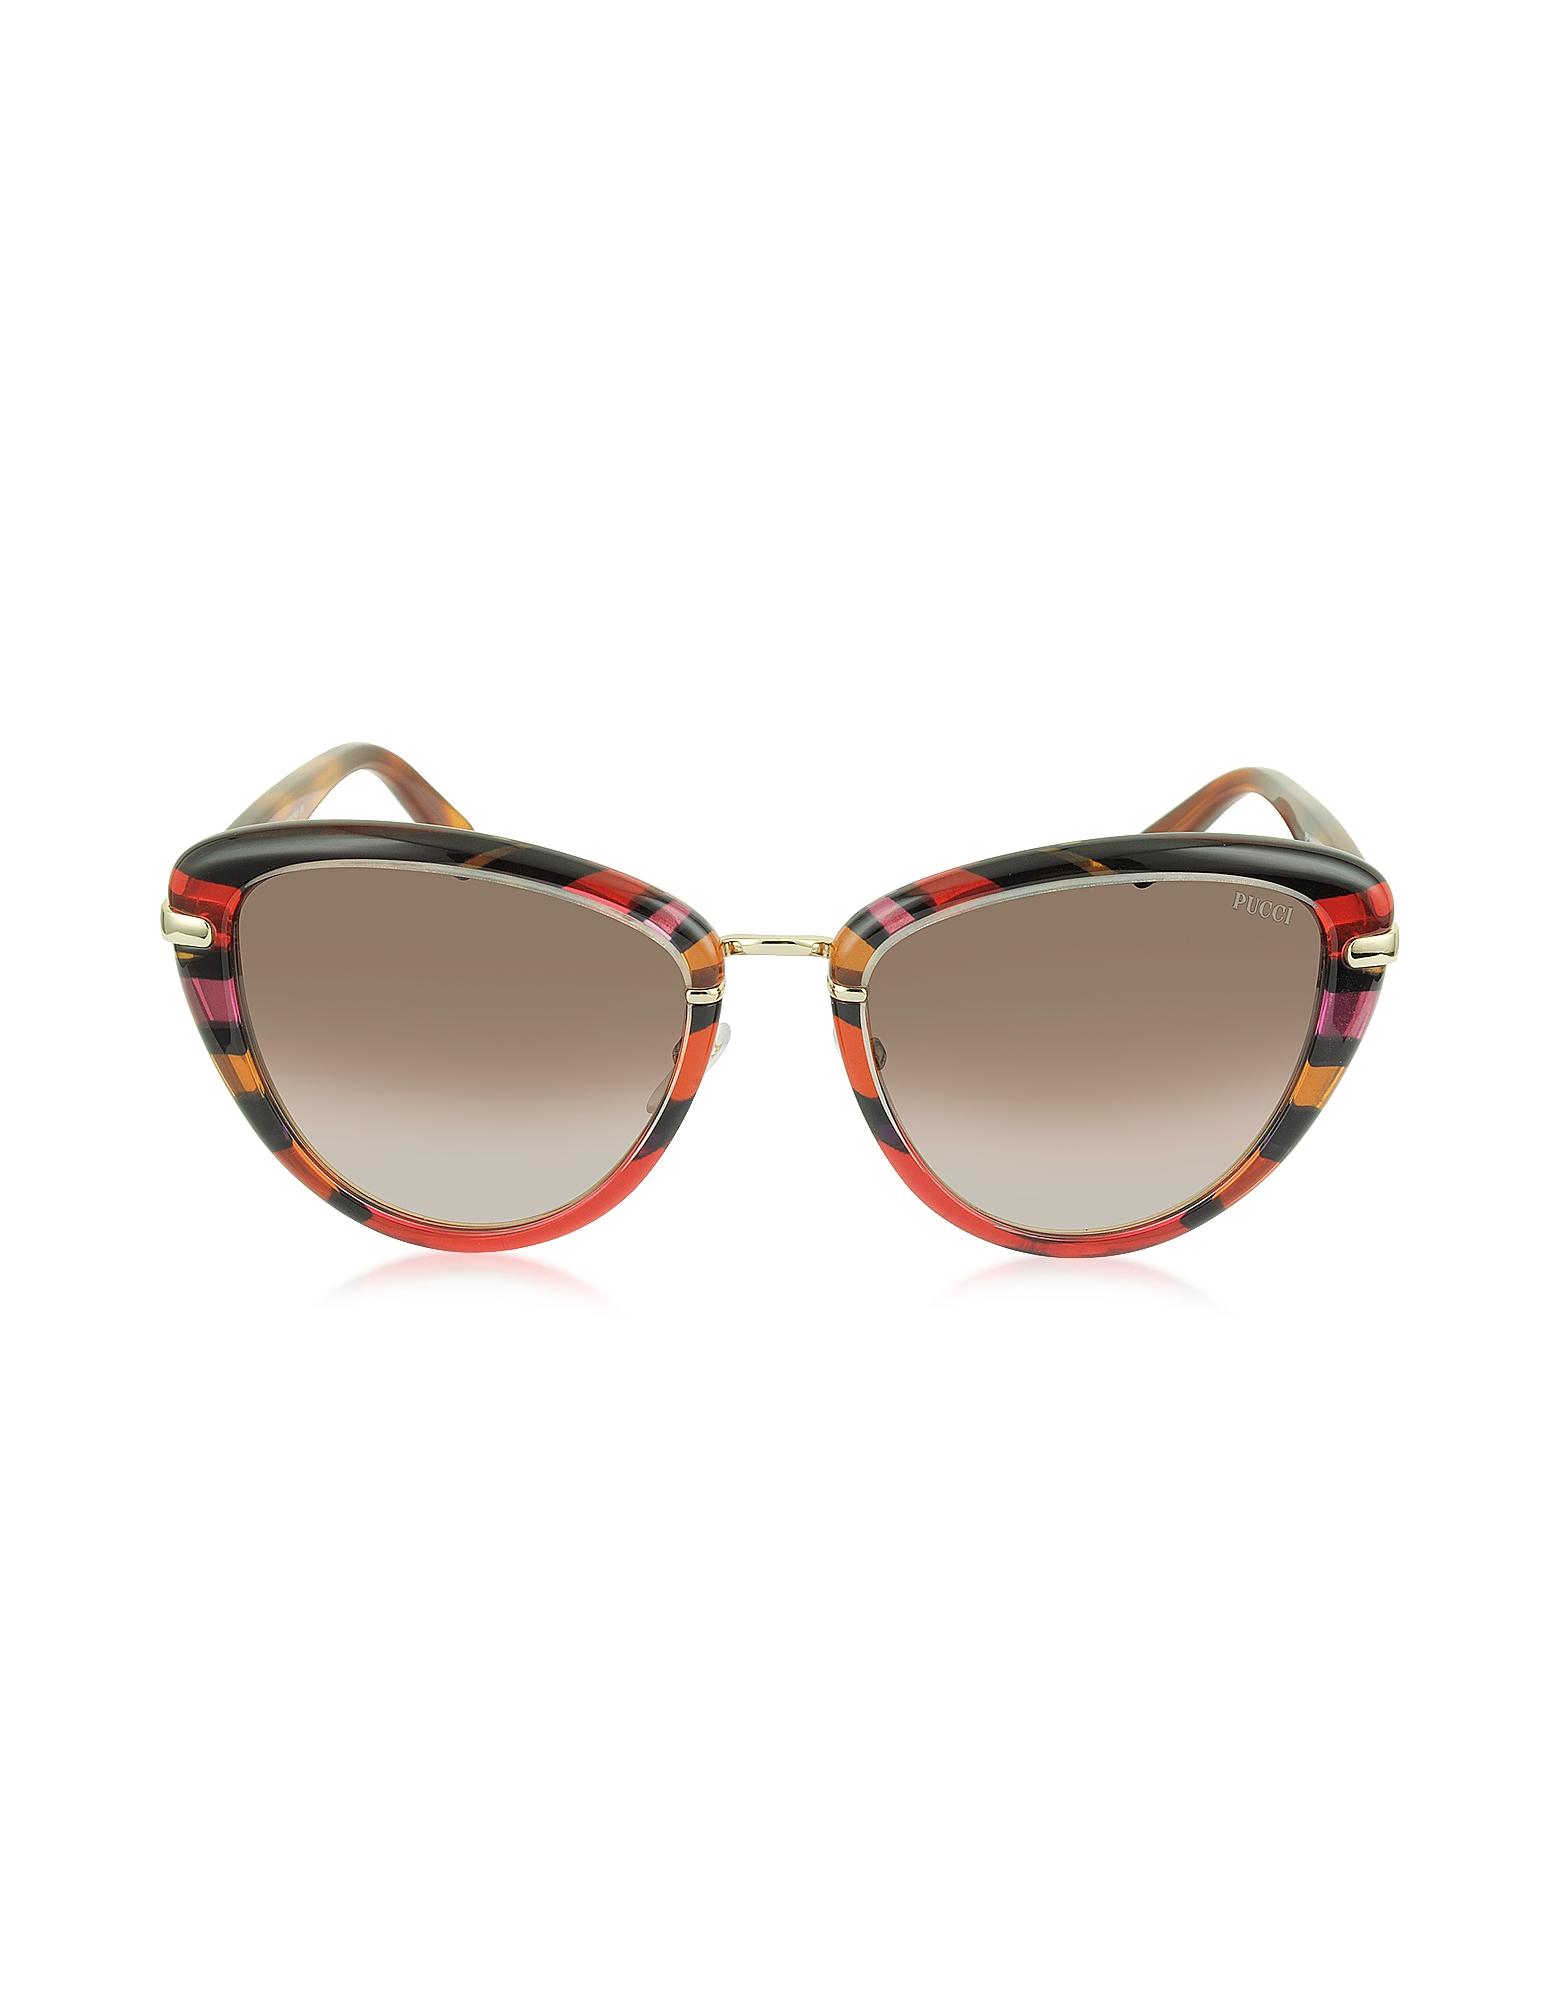 Emilio Pucci Sunglasses, EP0011 Fantasy Acetate Frame Cat Eye Sunglasses